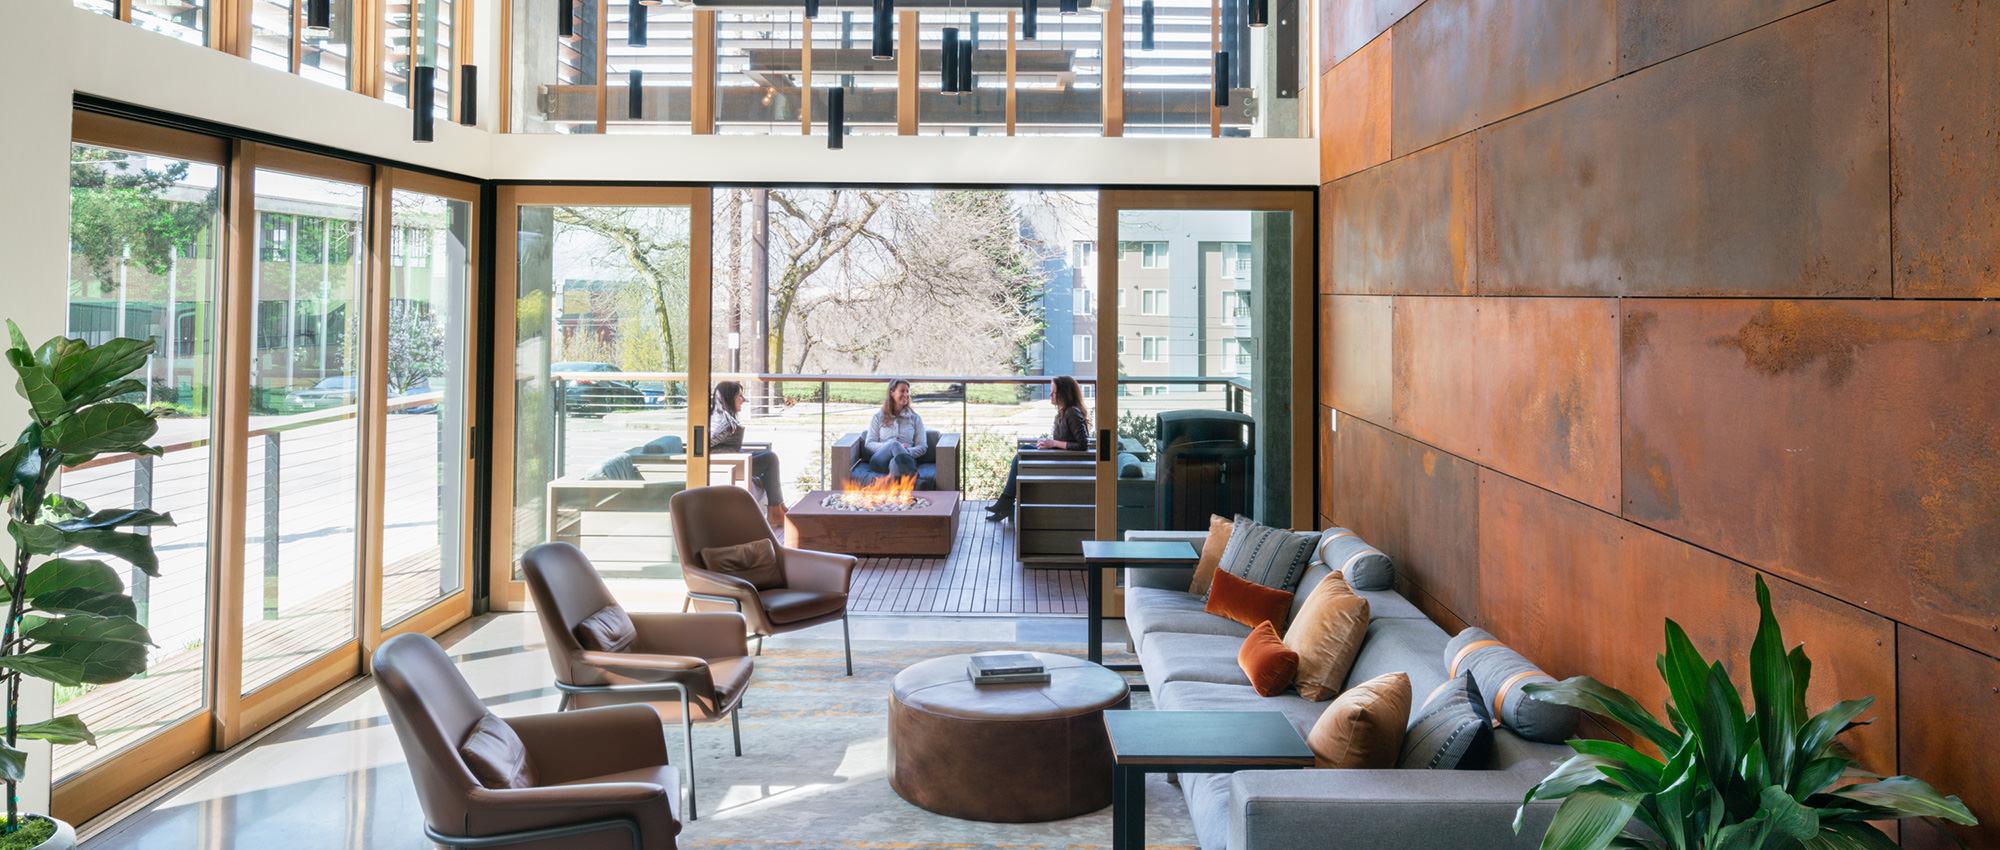 Elan Uptown Flats Interior Design